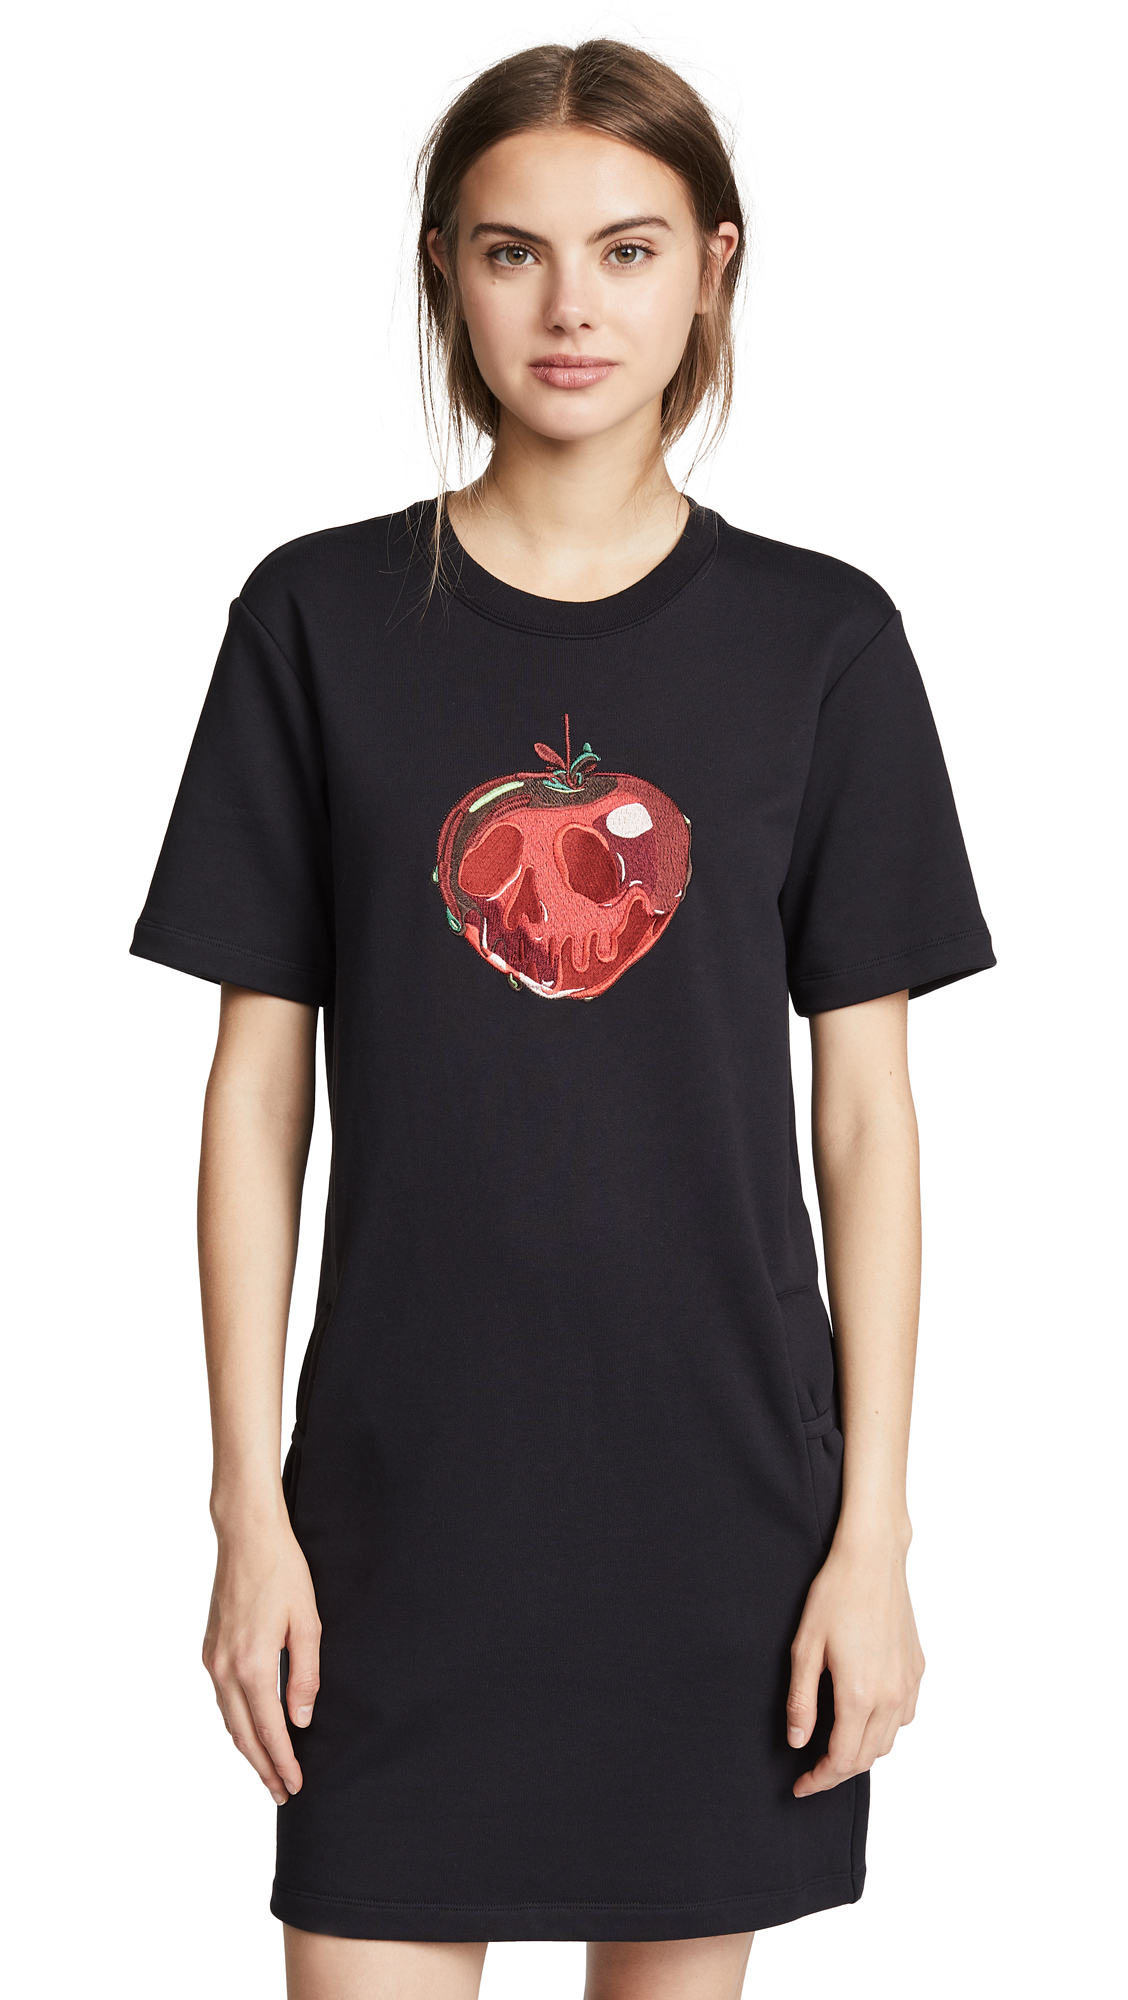 Coach 1941 x Disney Poison Apple T-shirt Dress